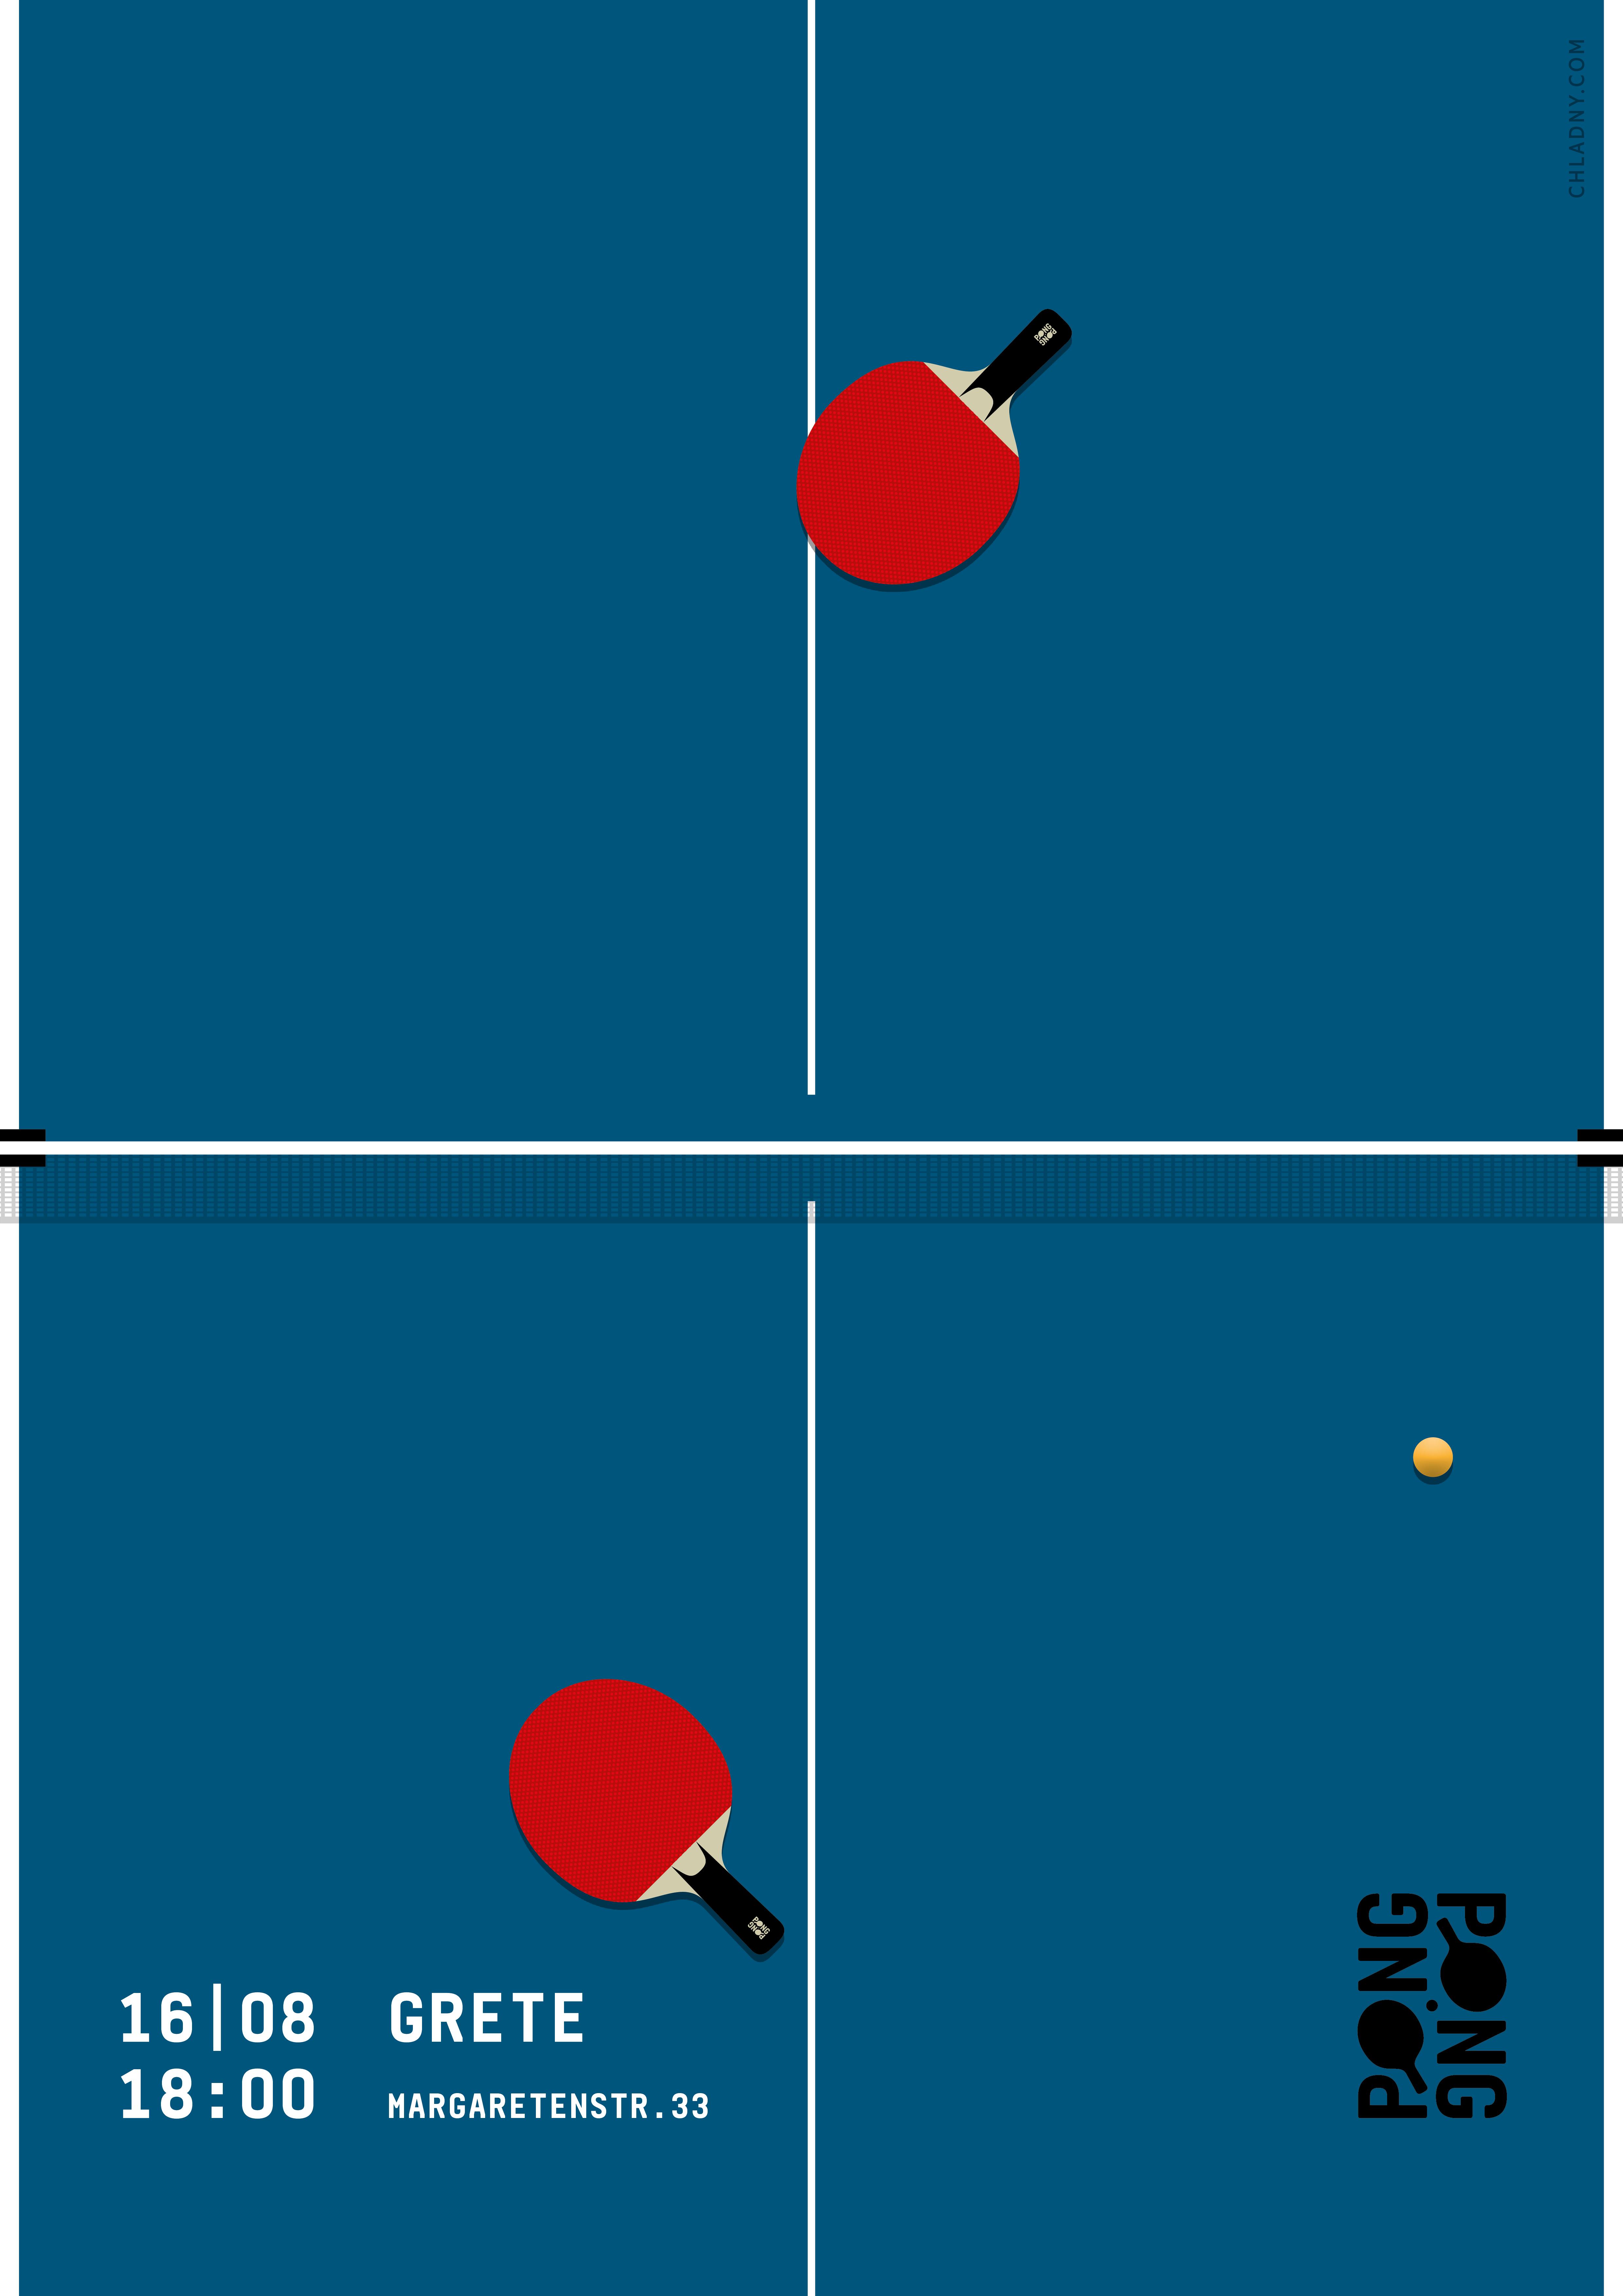 Butterfly Outdoor Playback Table Tennis Table Kreative Plakate Illustration Design Tischtennis